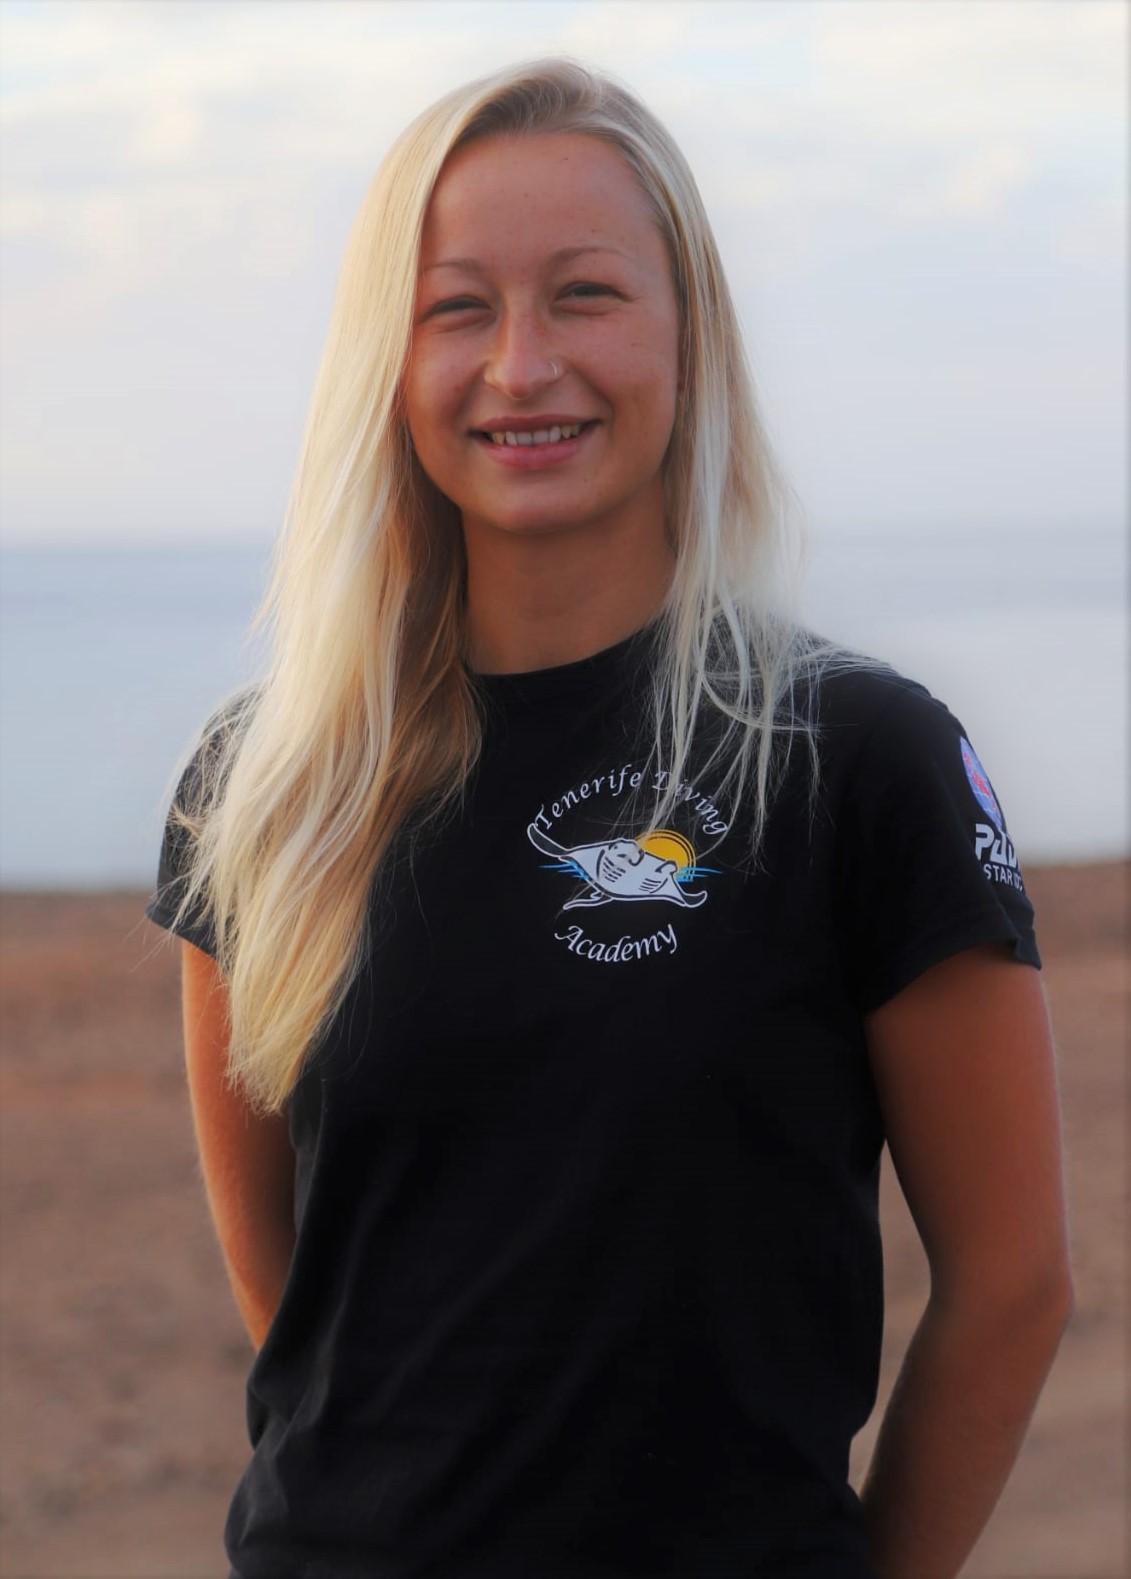 PADI Instructor Tenerife female